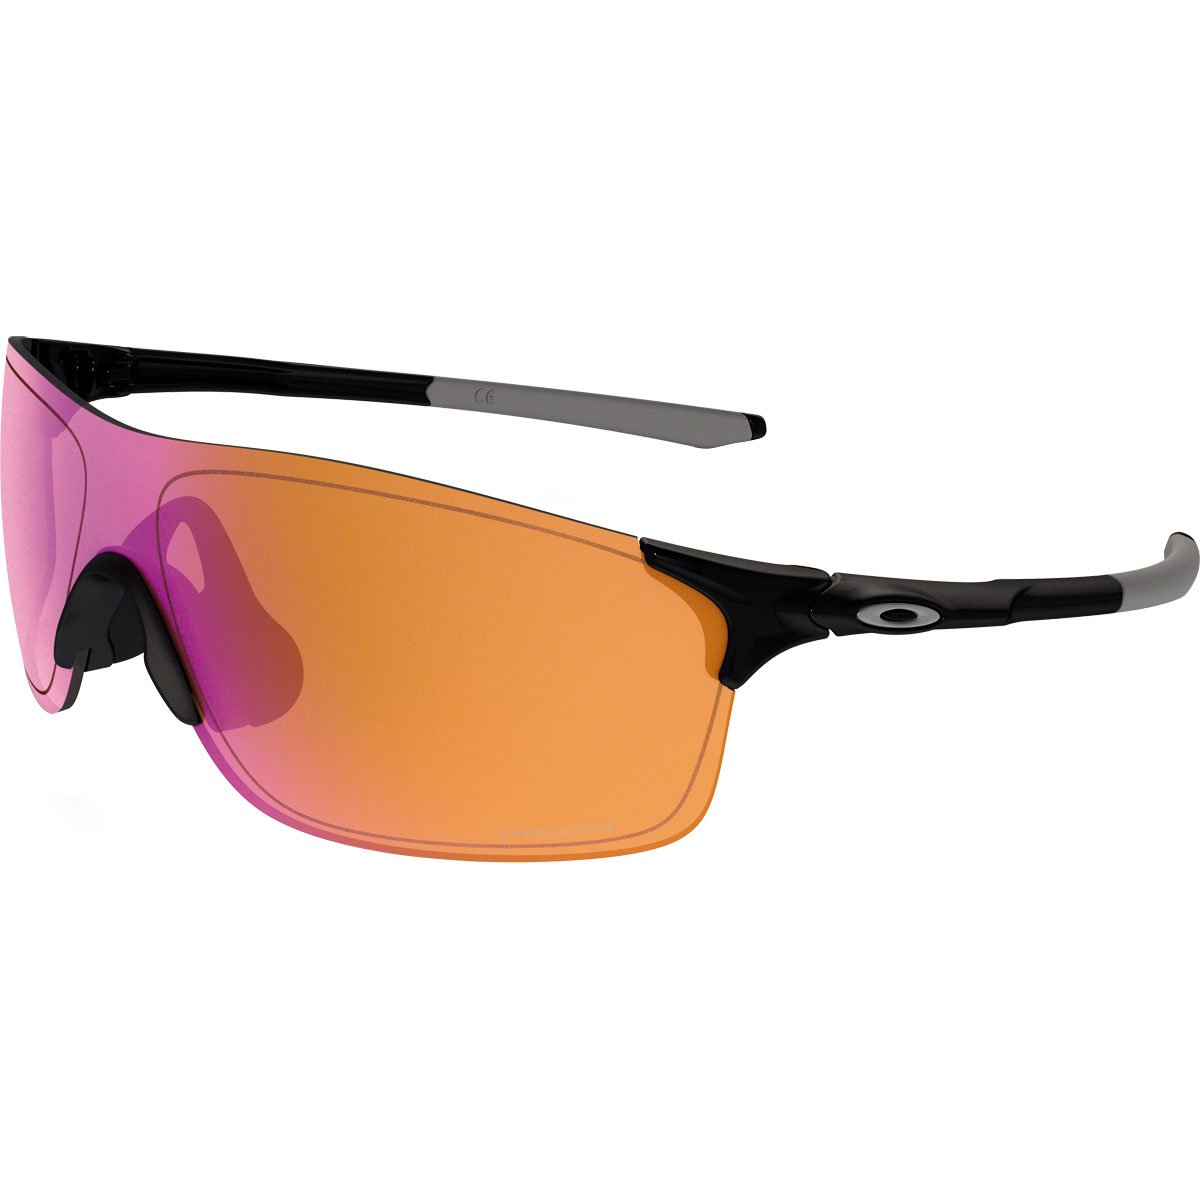 Oakley Men's Evzero Pitch Non-Polarized Iridium Rectangular Sunglasses, Polished Black, 38 mm